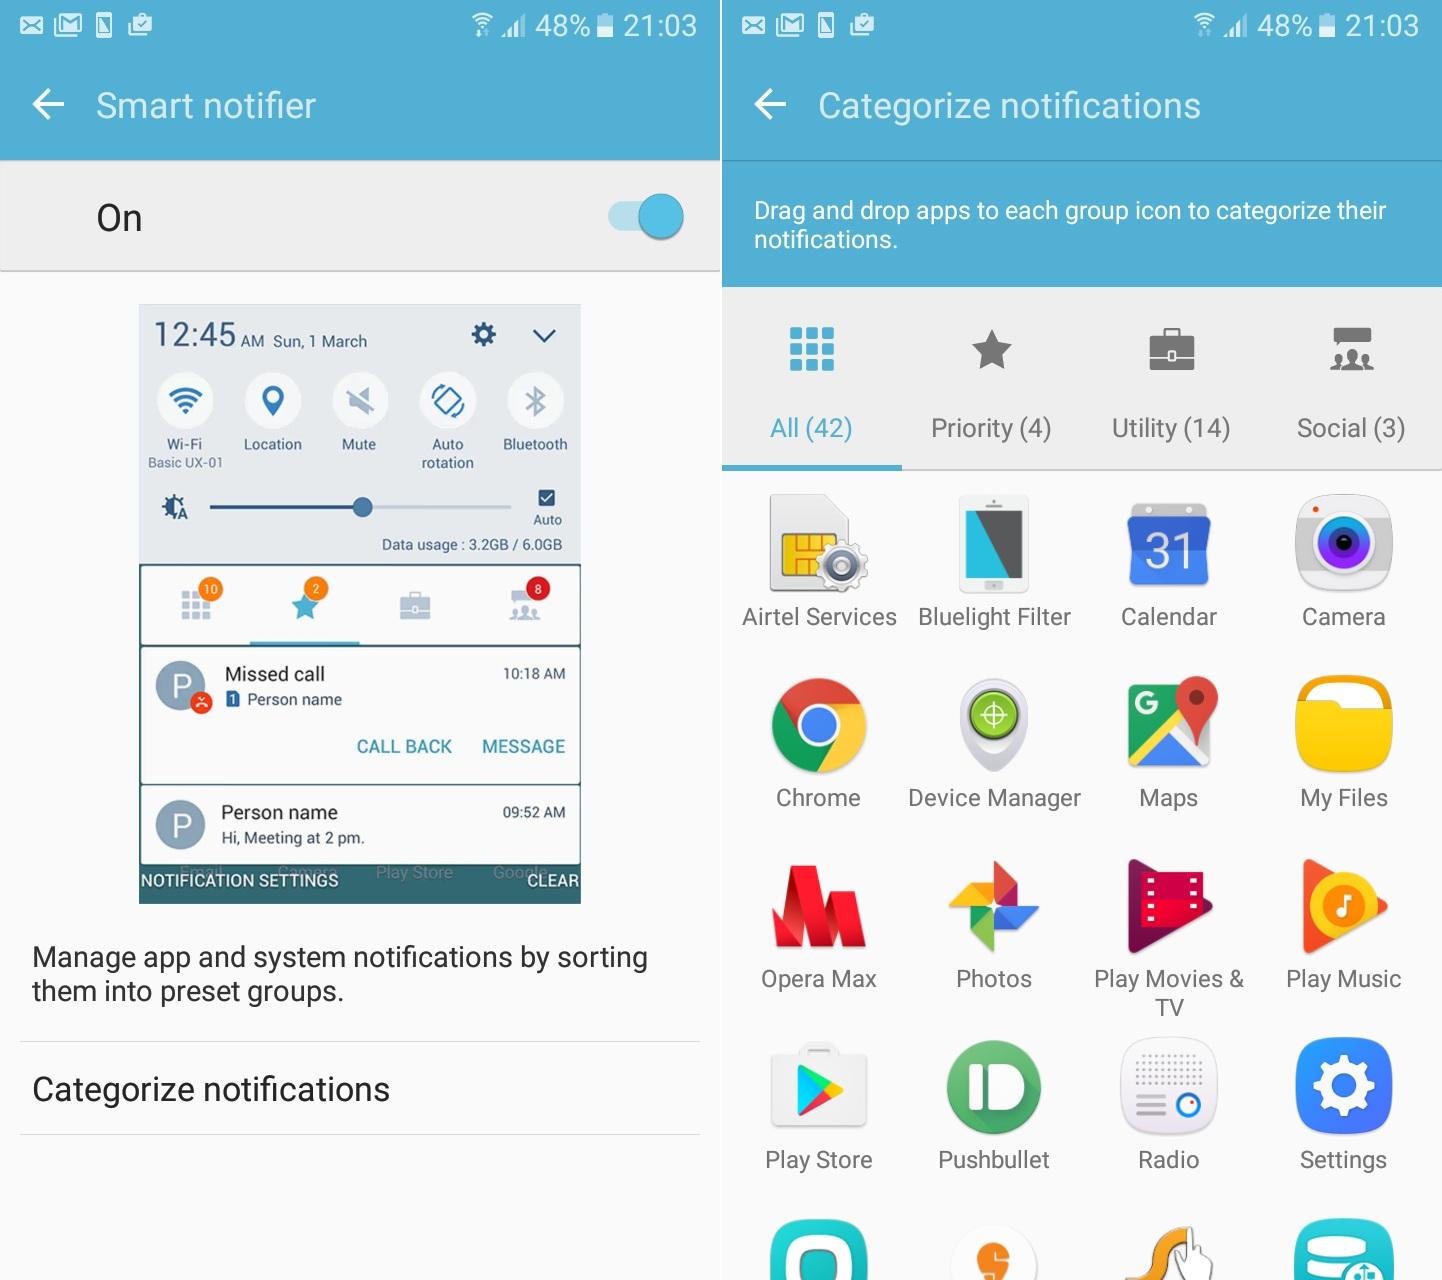 Samsung Galaxy J2 (2016) Review: A budget phone that fails